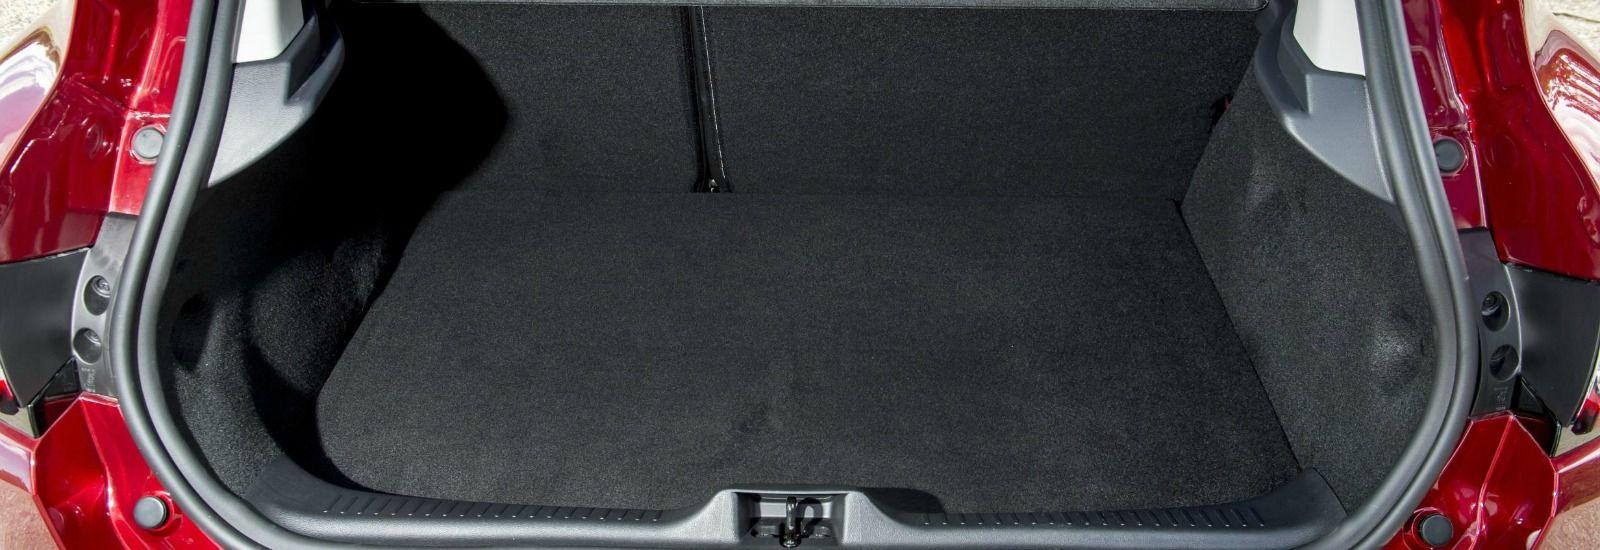 renault clio 2015 trunk size. Black Bedroom Furniture Sets. Home Design Ideas